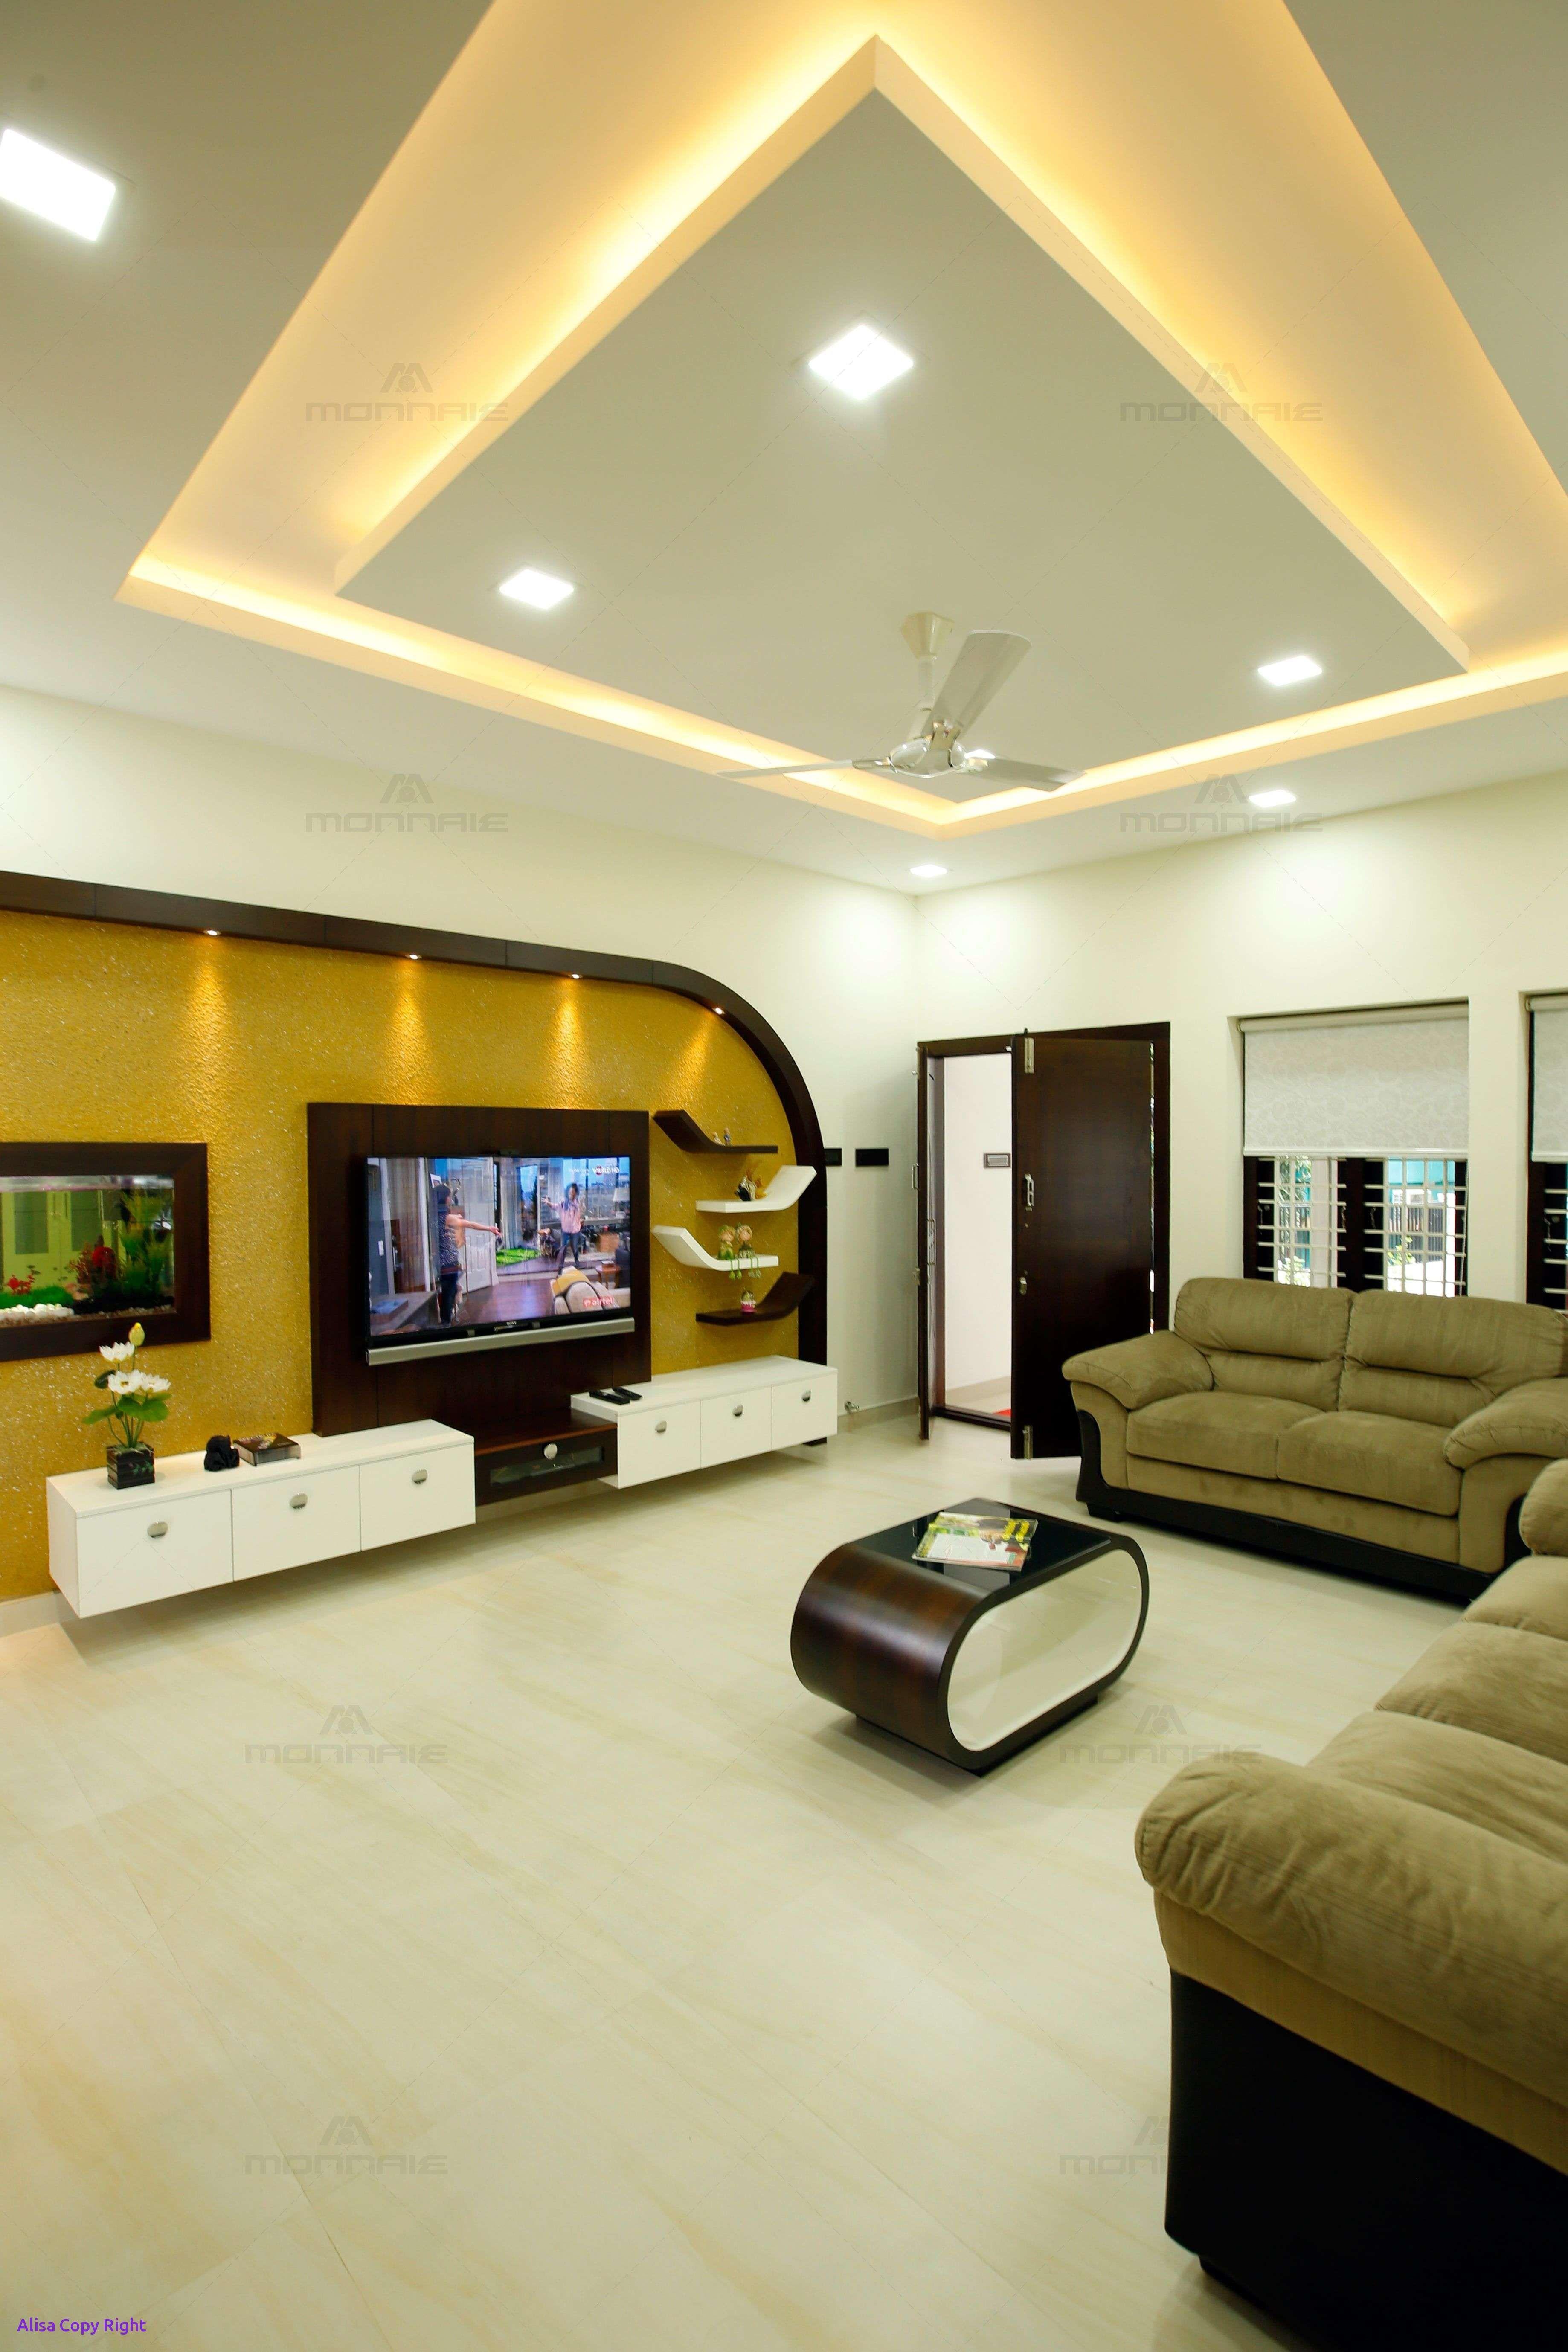 Small Living Room Ceiling Design: Living Room Ceiling Designs